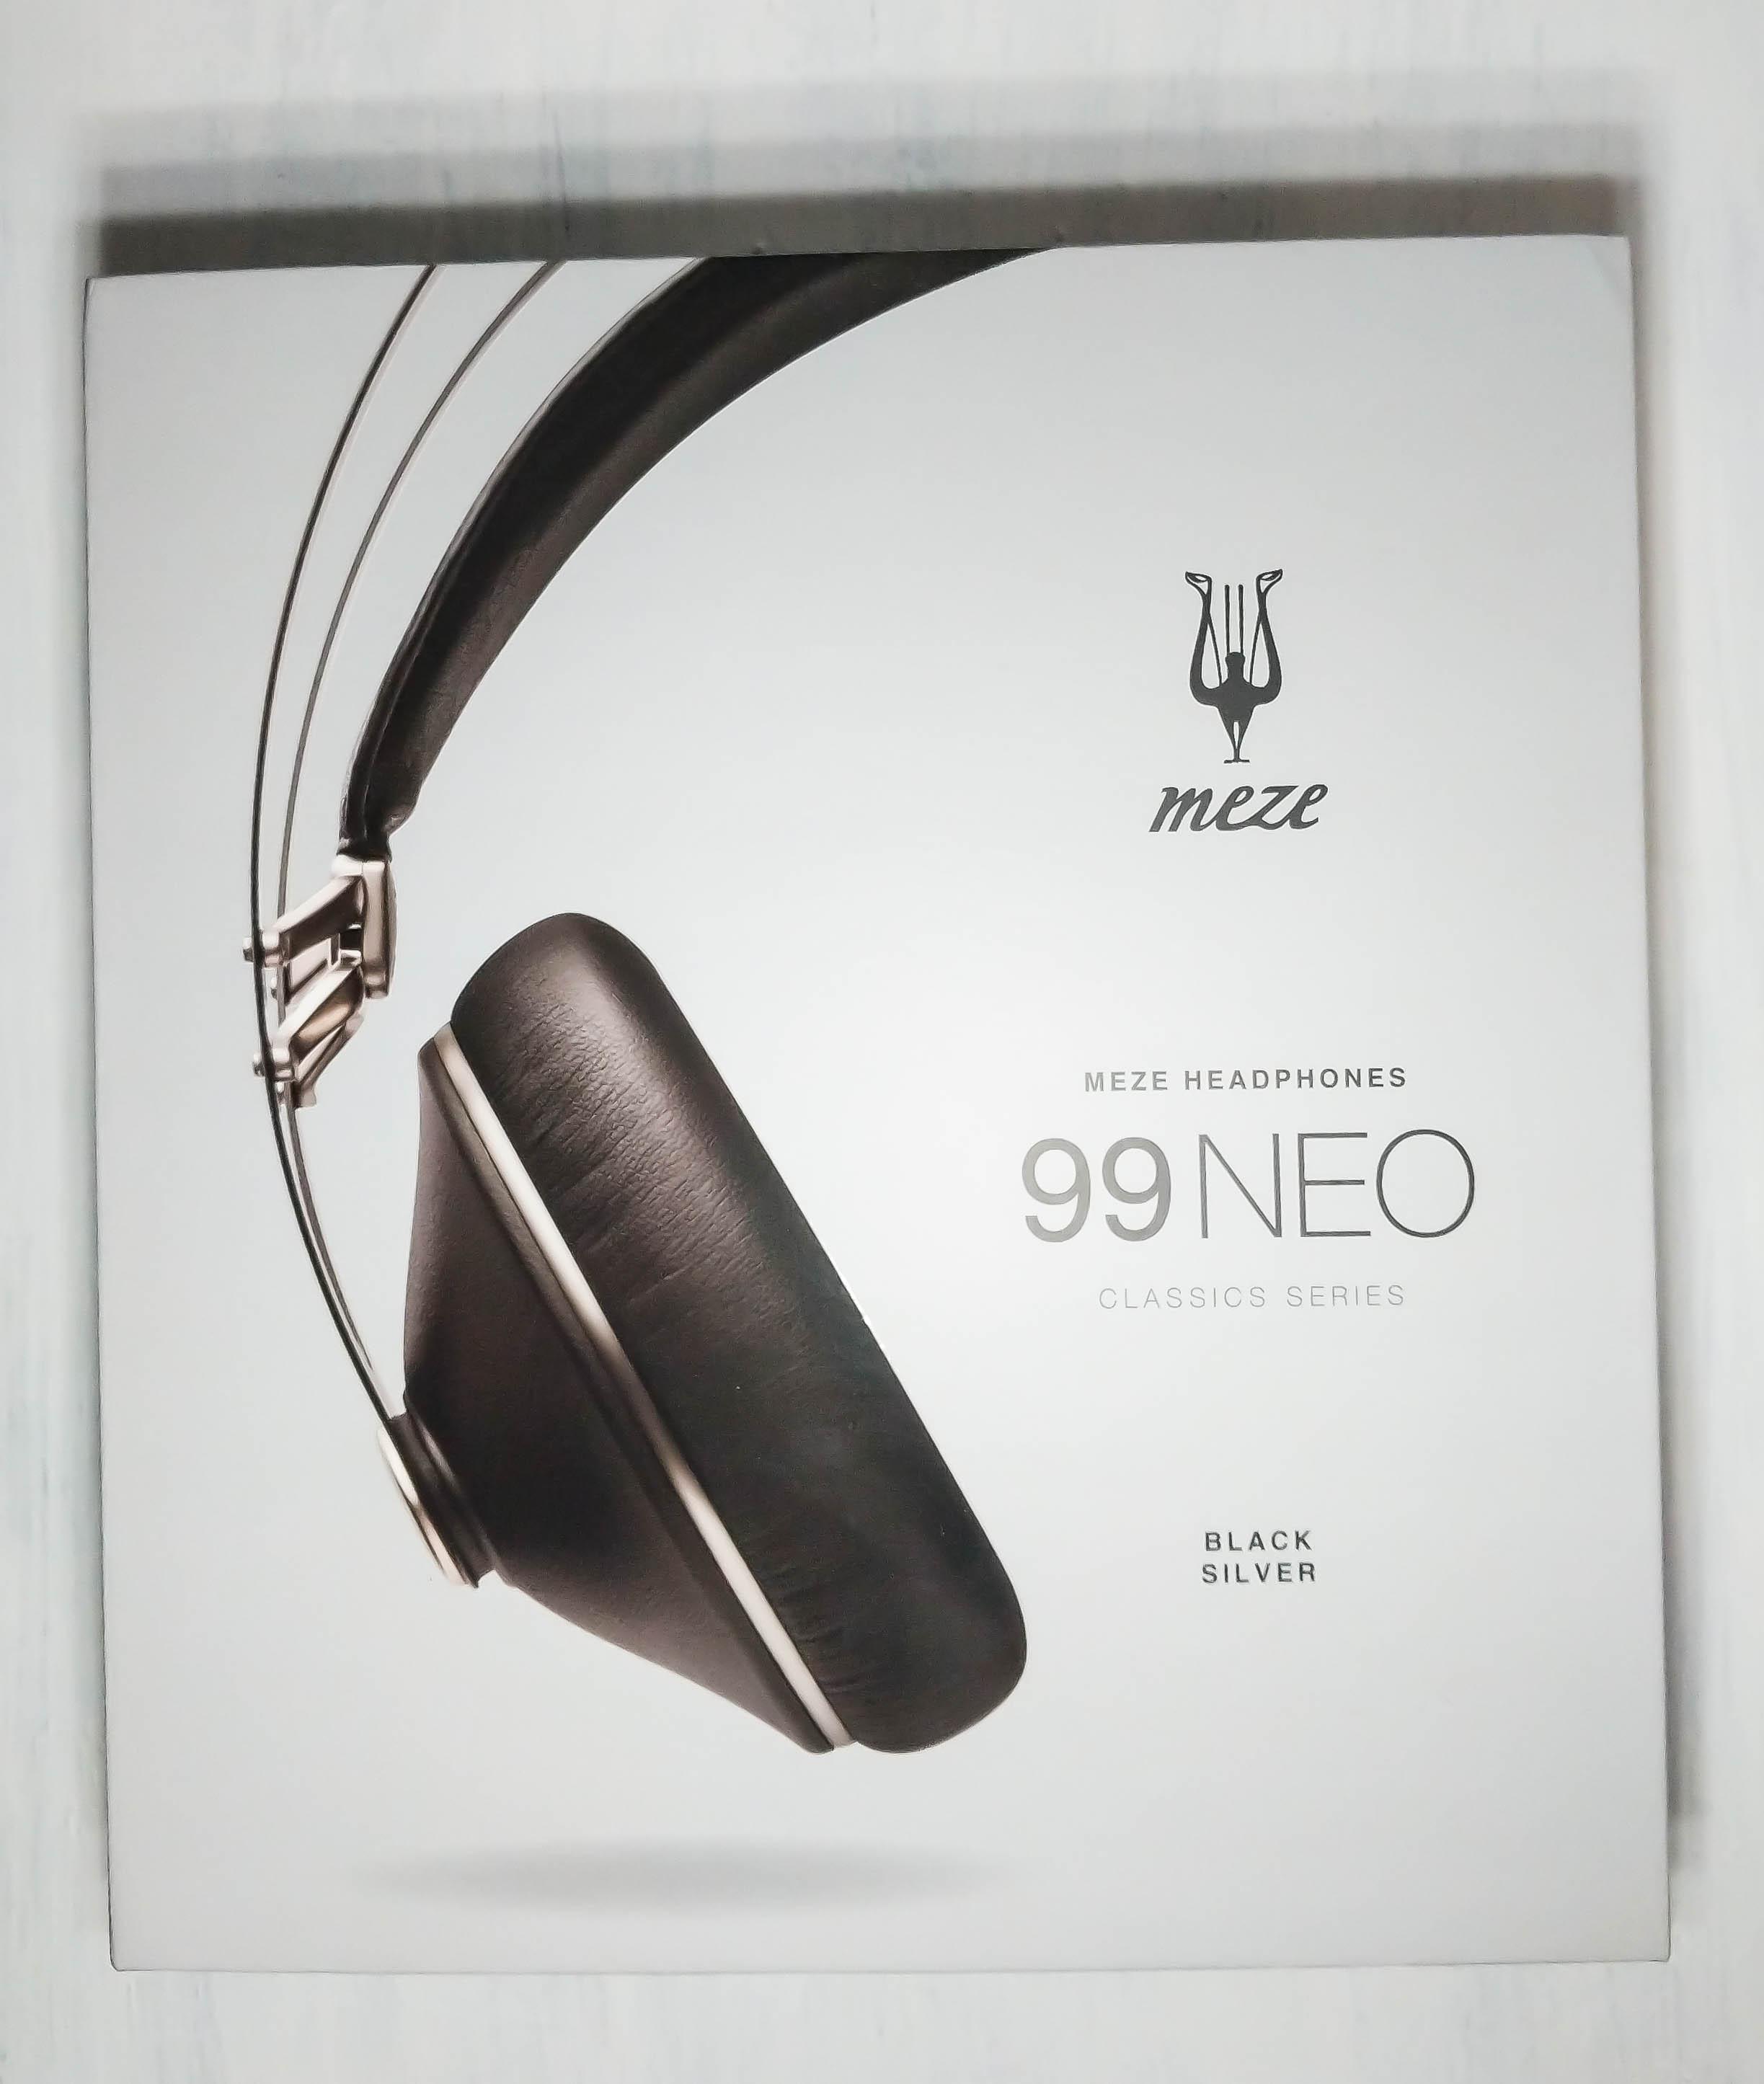 Box for the Meze 99 Neo headphone.